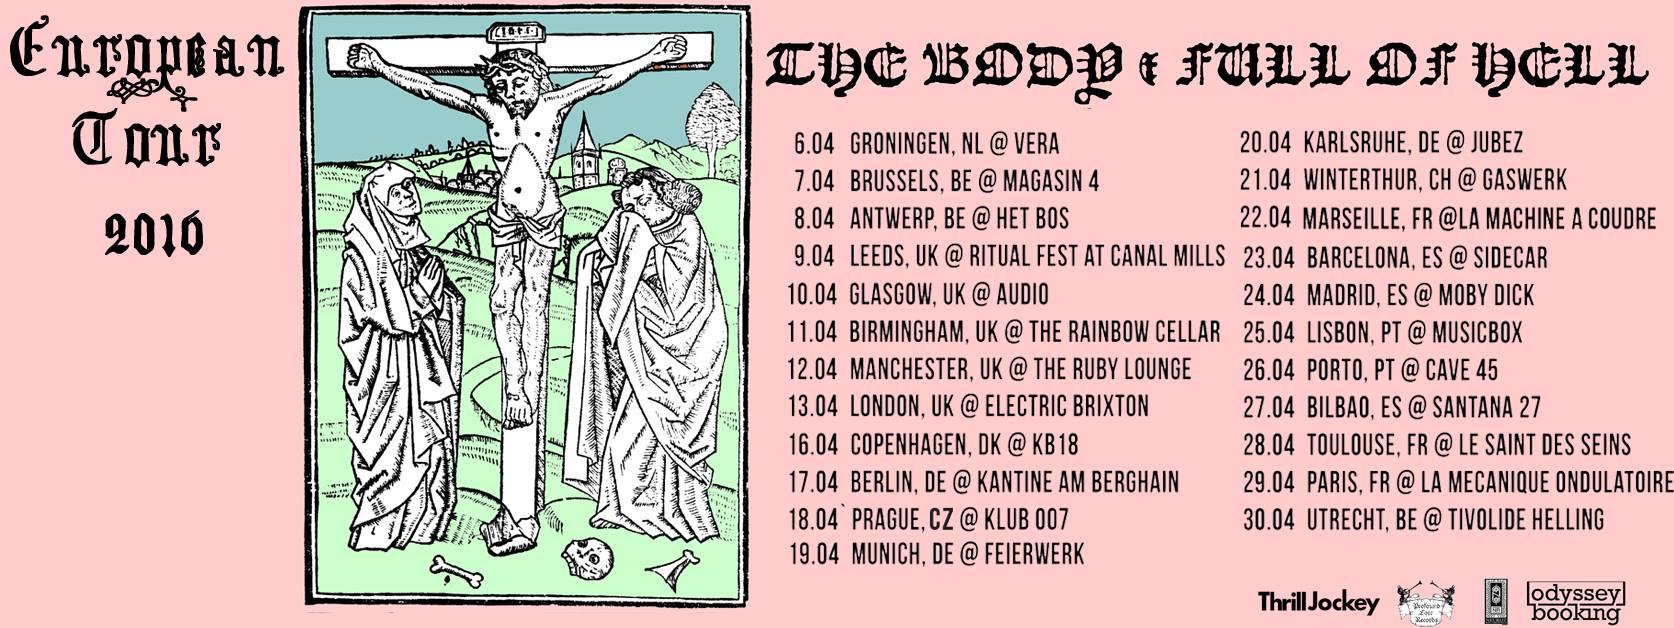 full of hell tour